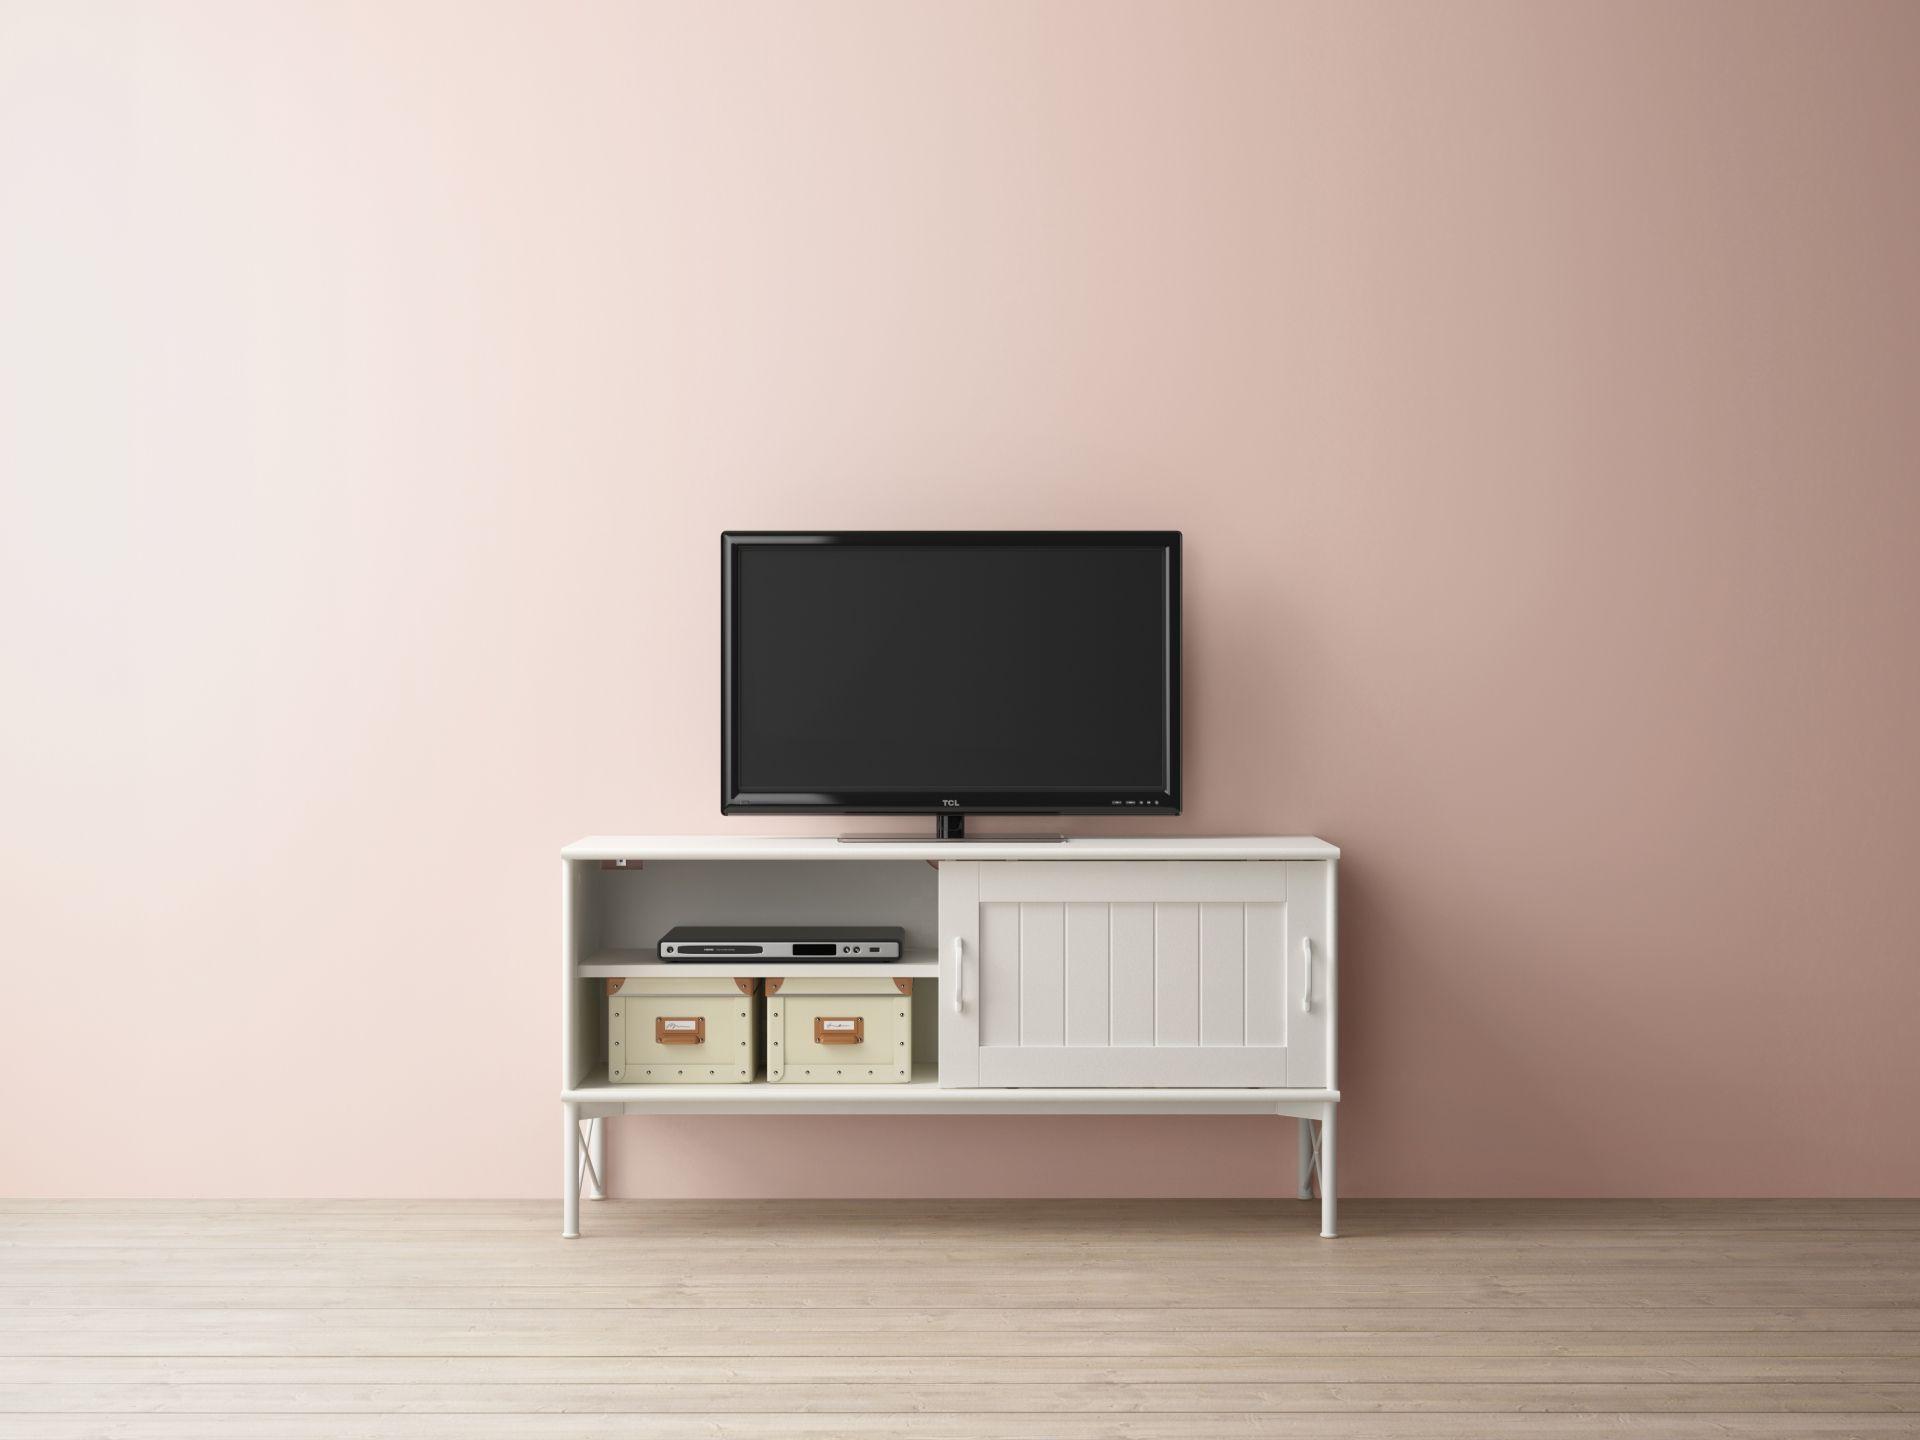 tockarp tv meubel ikeacatalogus nieuw 2017 ikea ikeanl